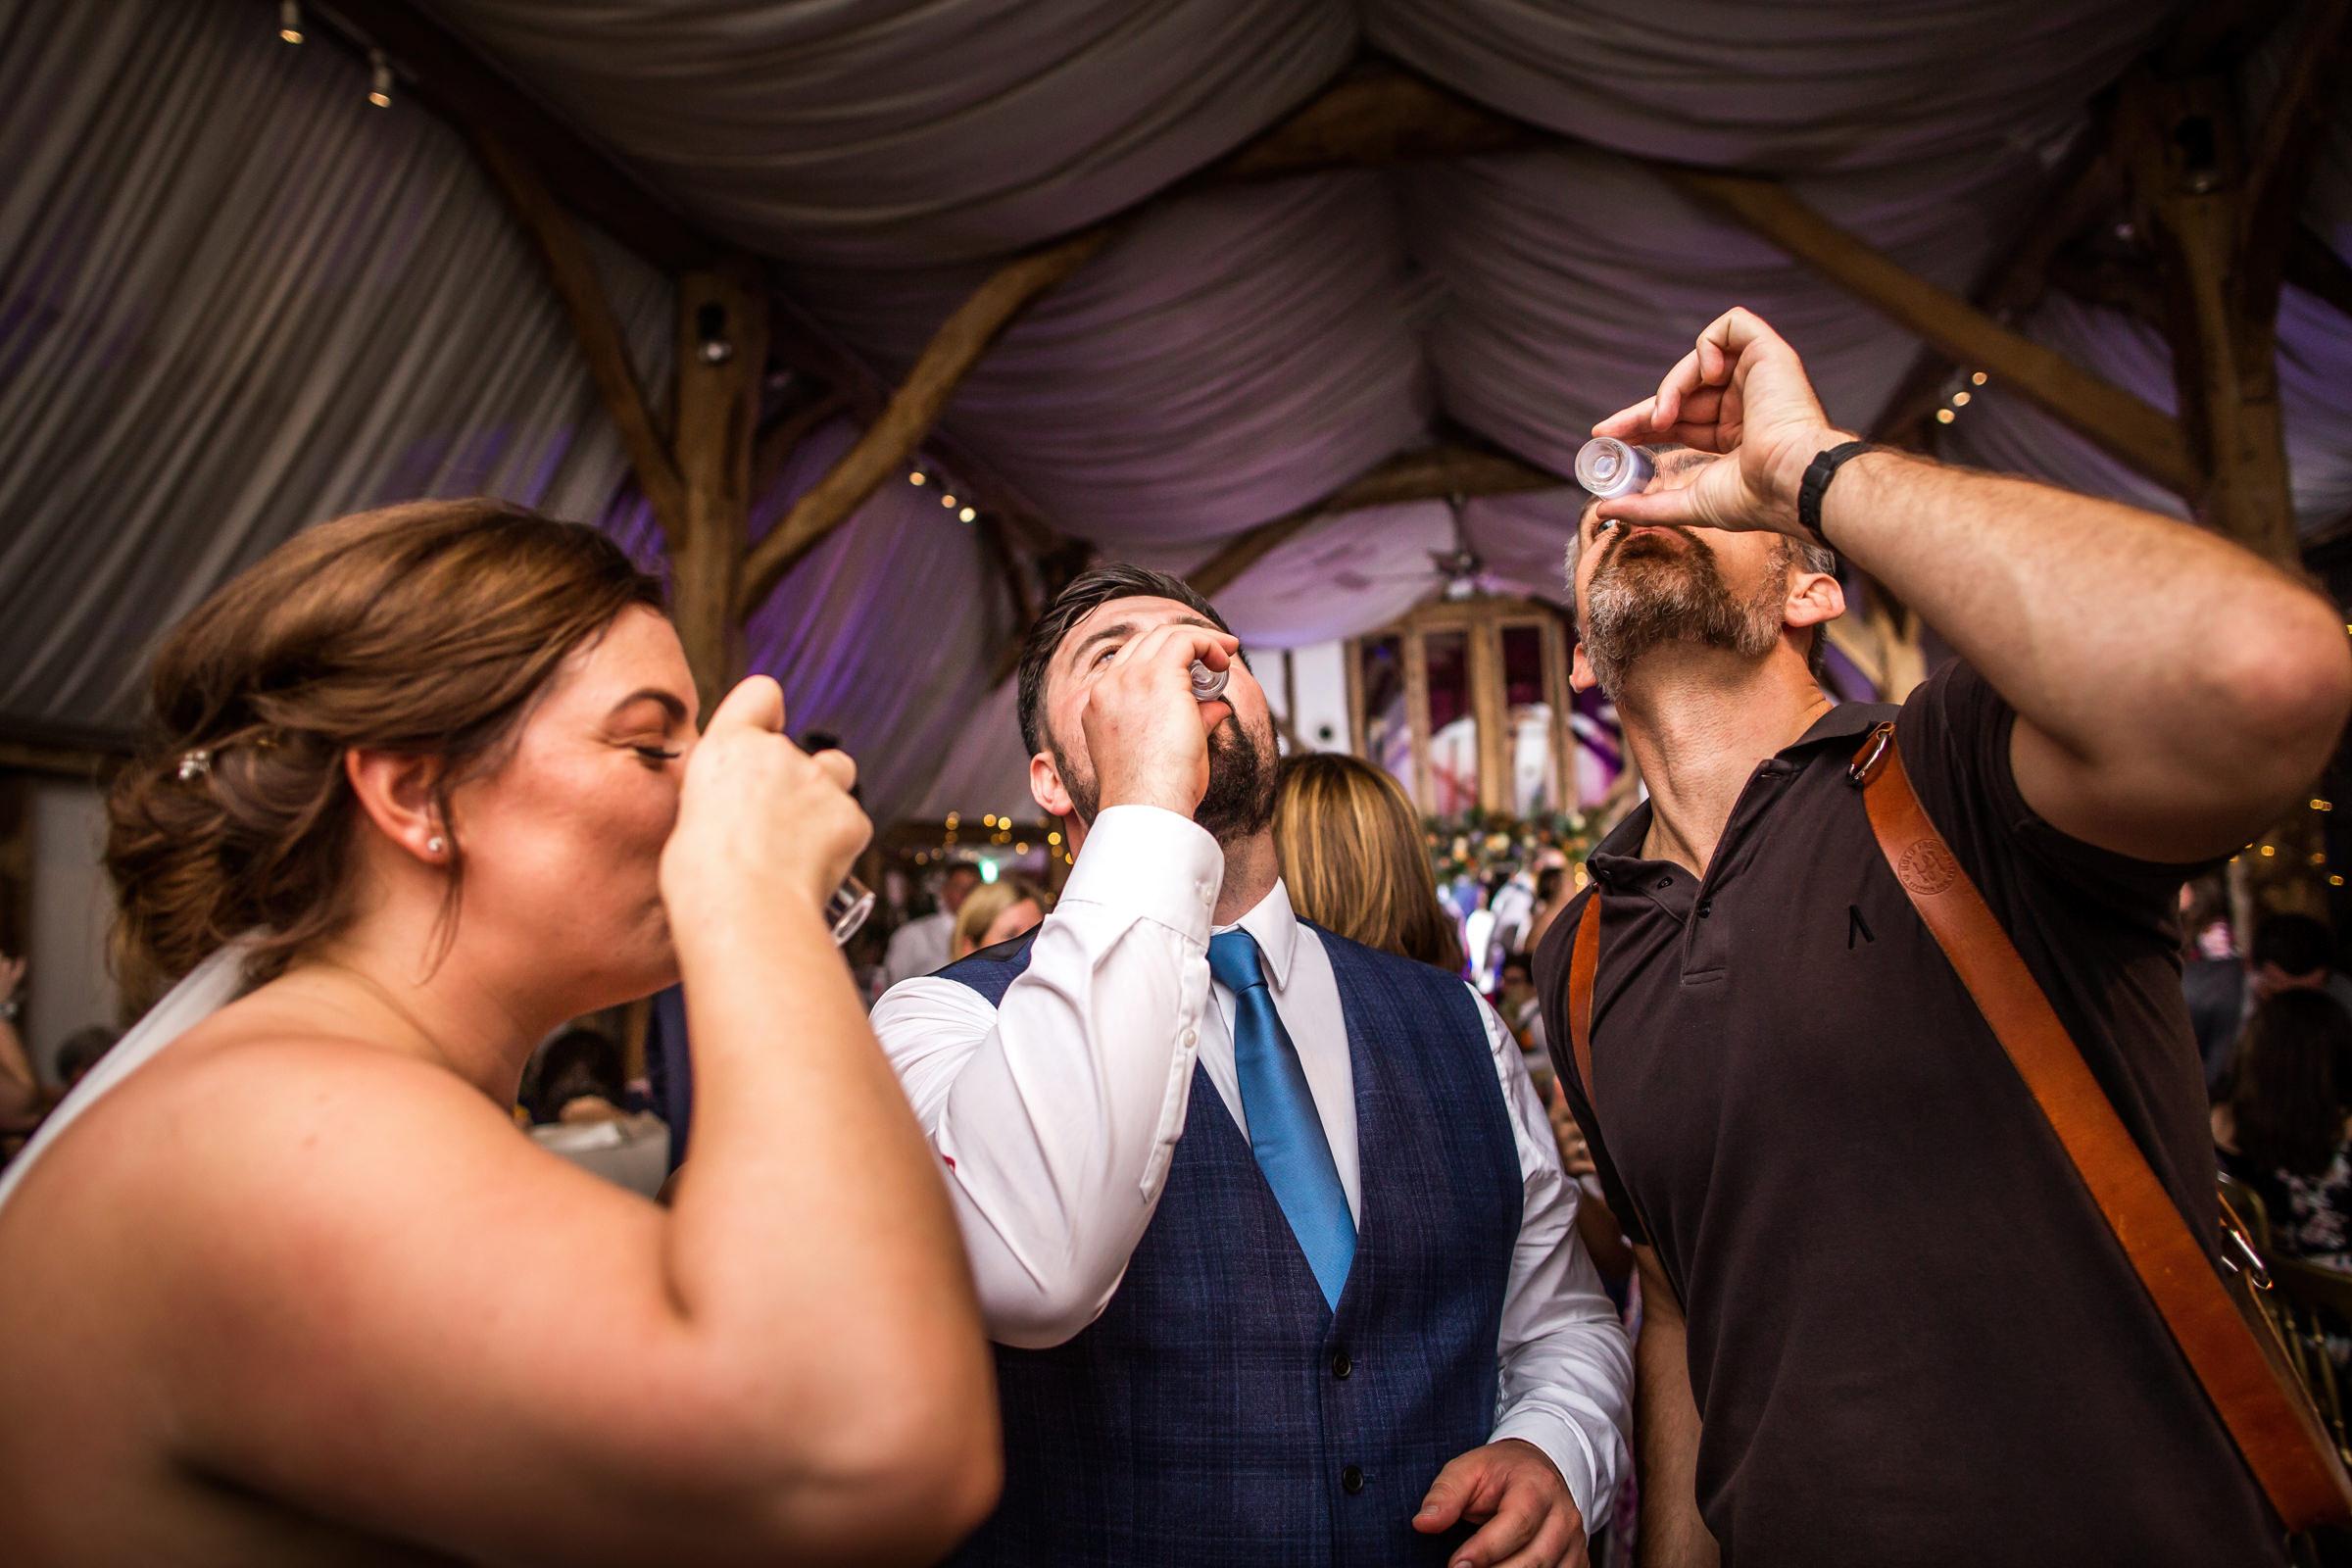 south farm wedding hertfordshire wedding photographer rafe abrook photography-1219.jpg